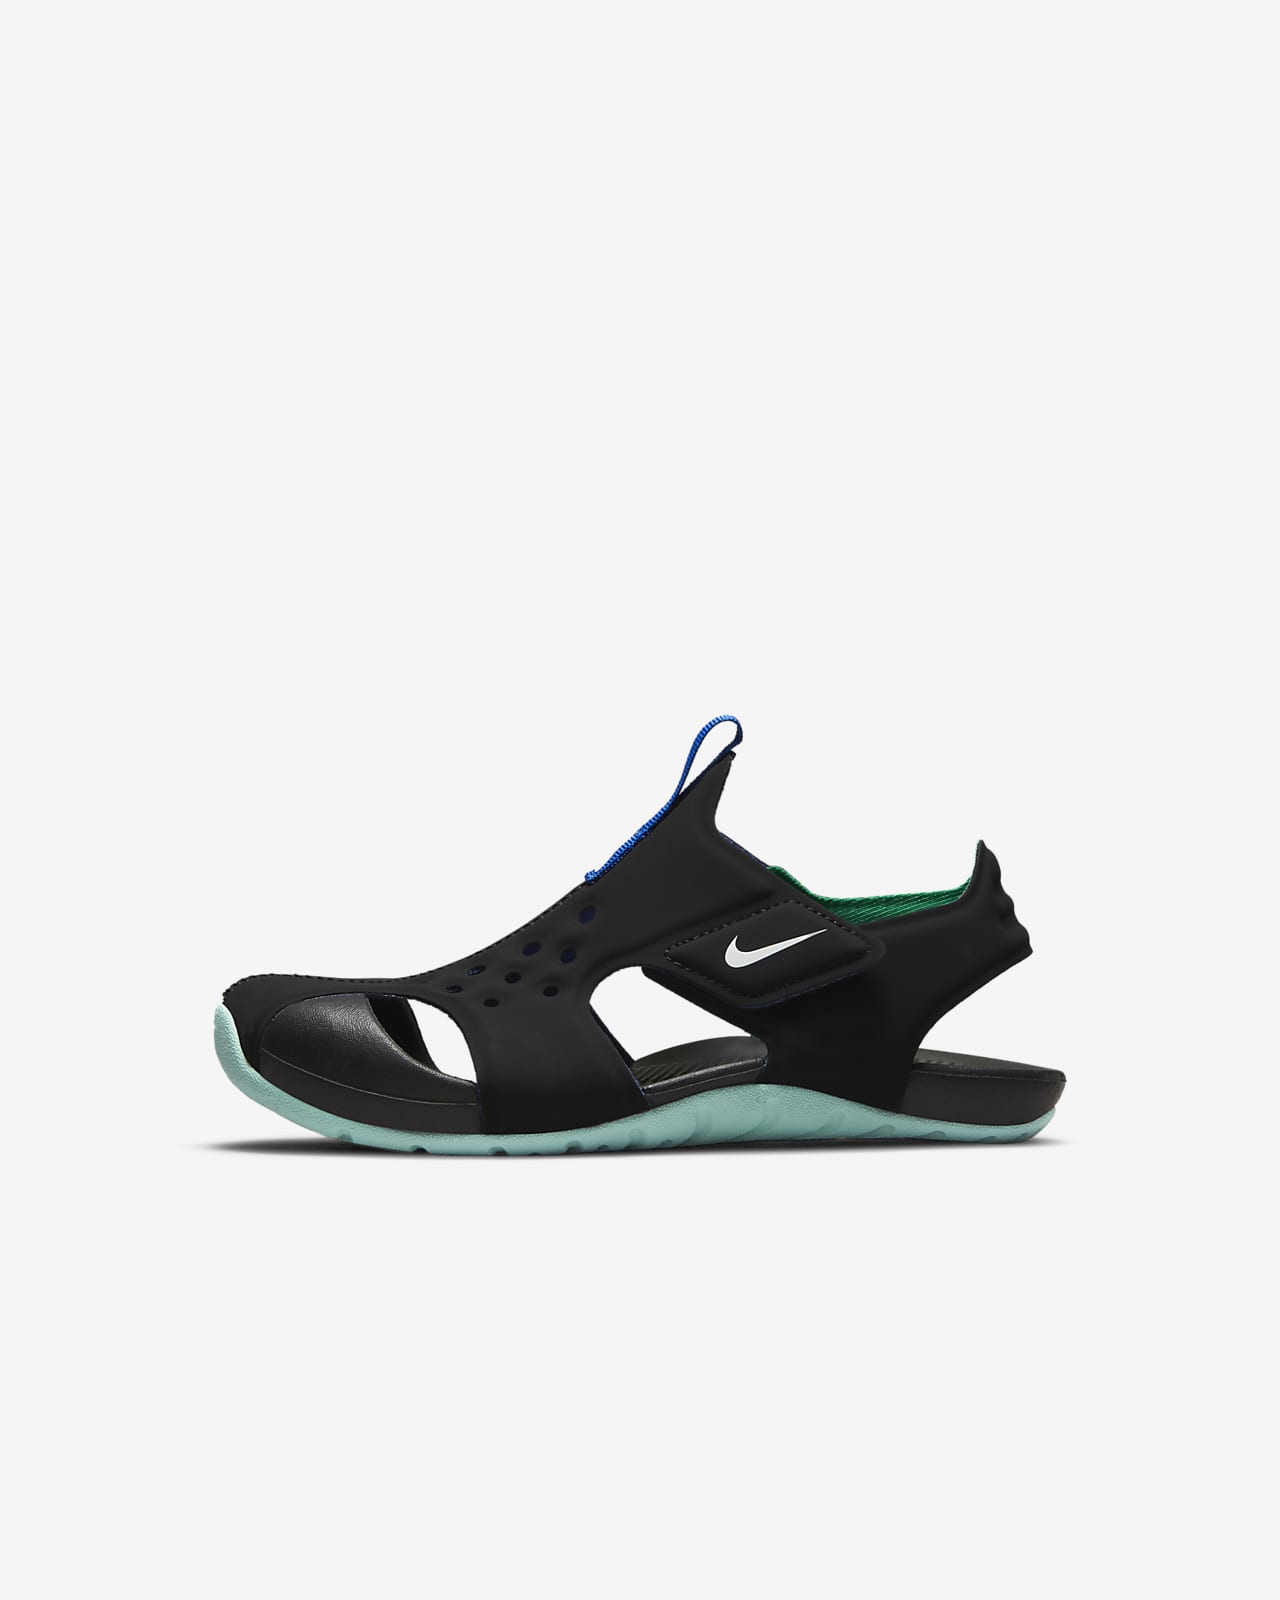 Nike Sunray Protect 2 BP 幼童凉鞋